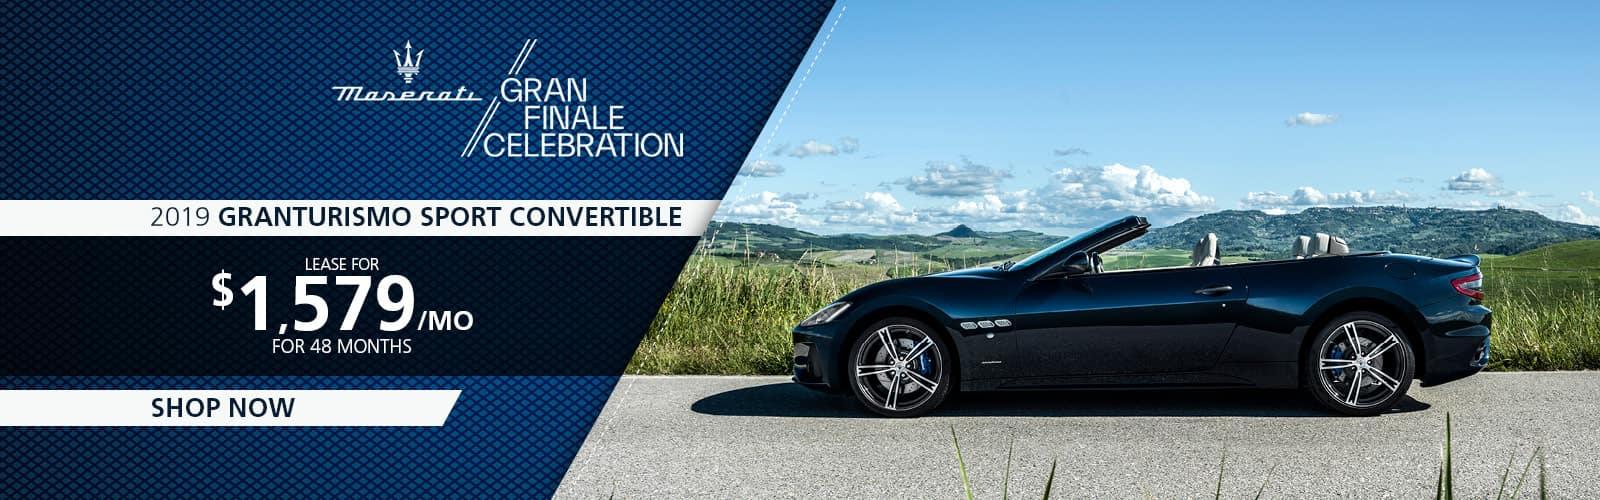 2019 Granturismo Sport Convertible